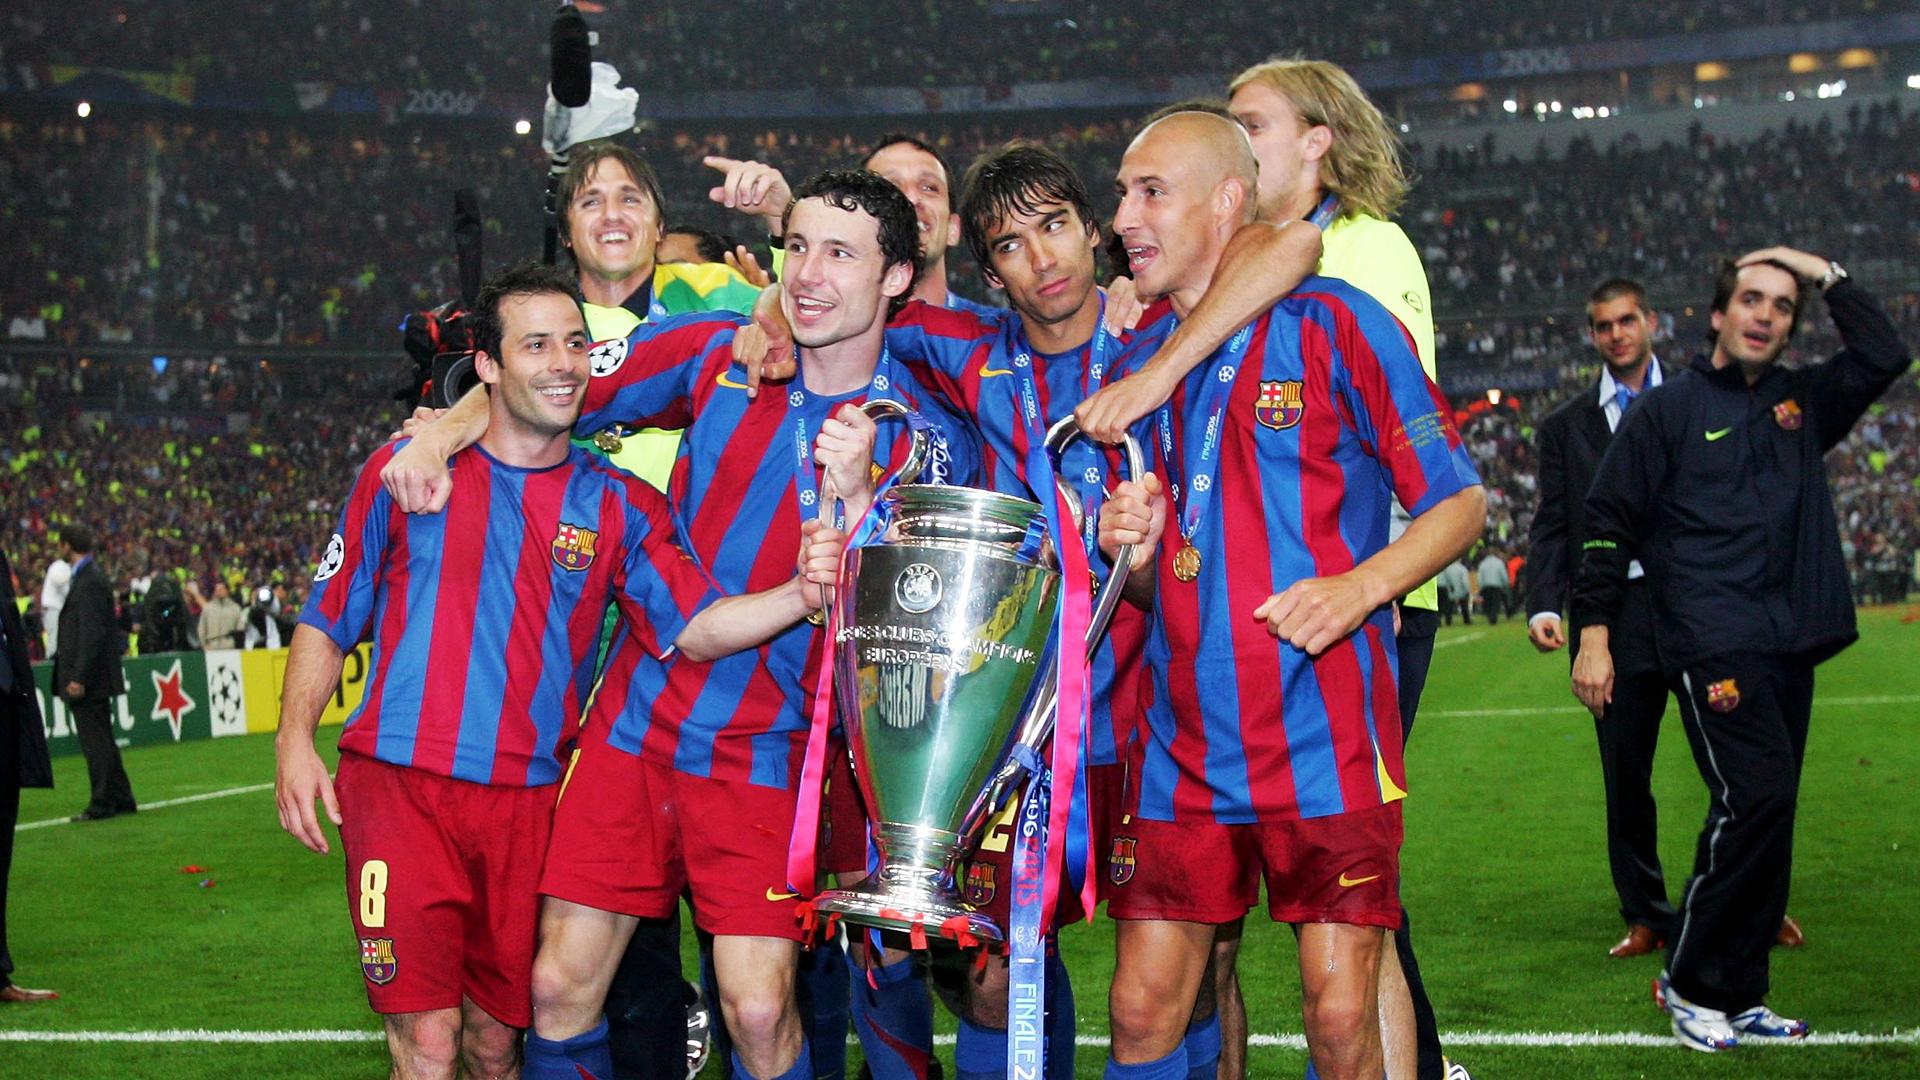 'Sutton was the best partner I had' - Larsson ranks ex-Celtic striker above former Barcelona team-mates